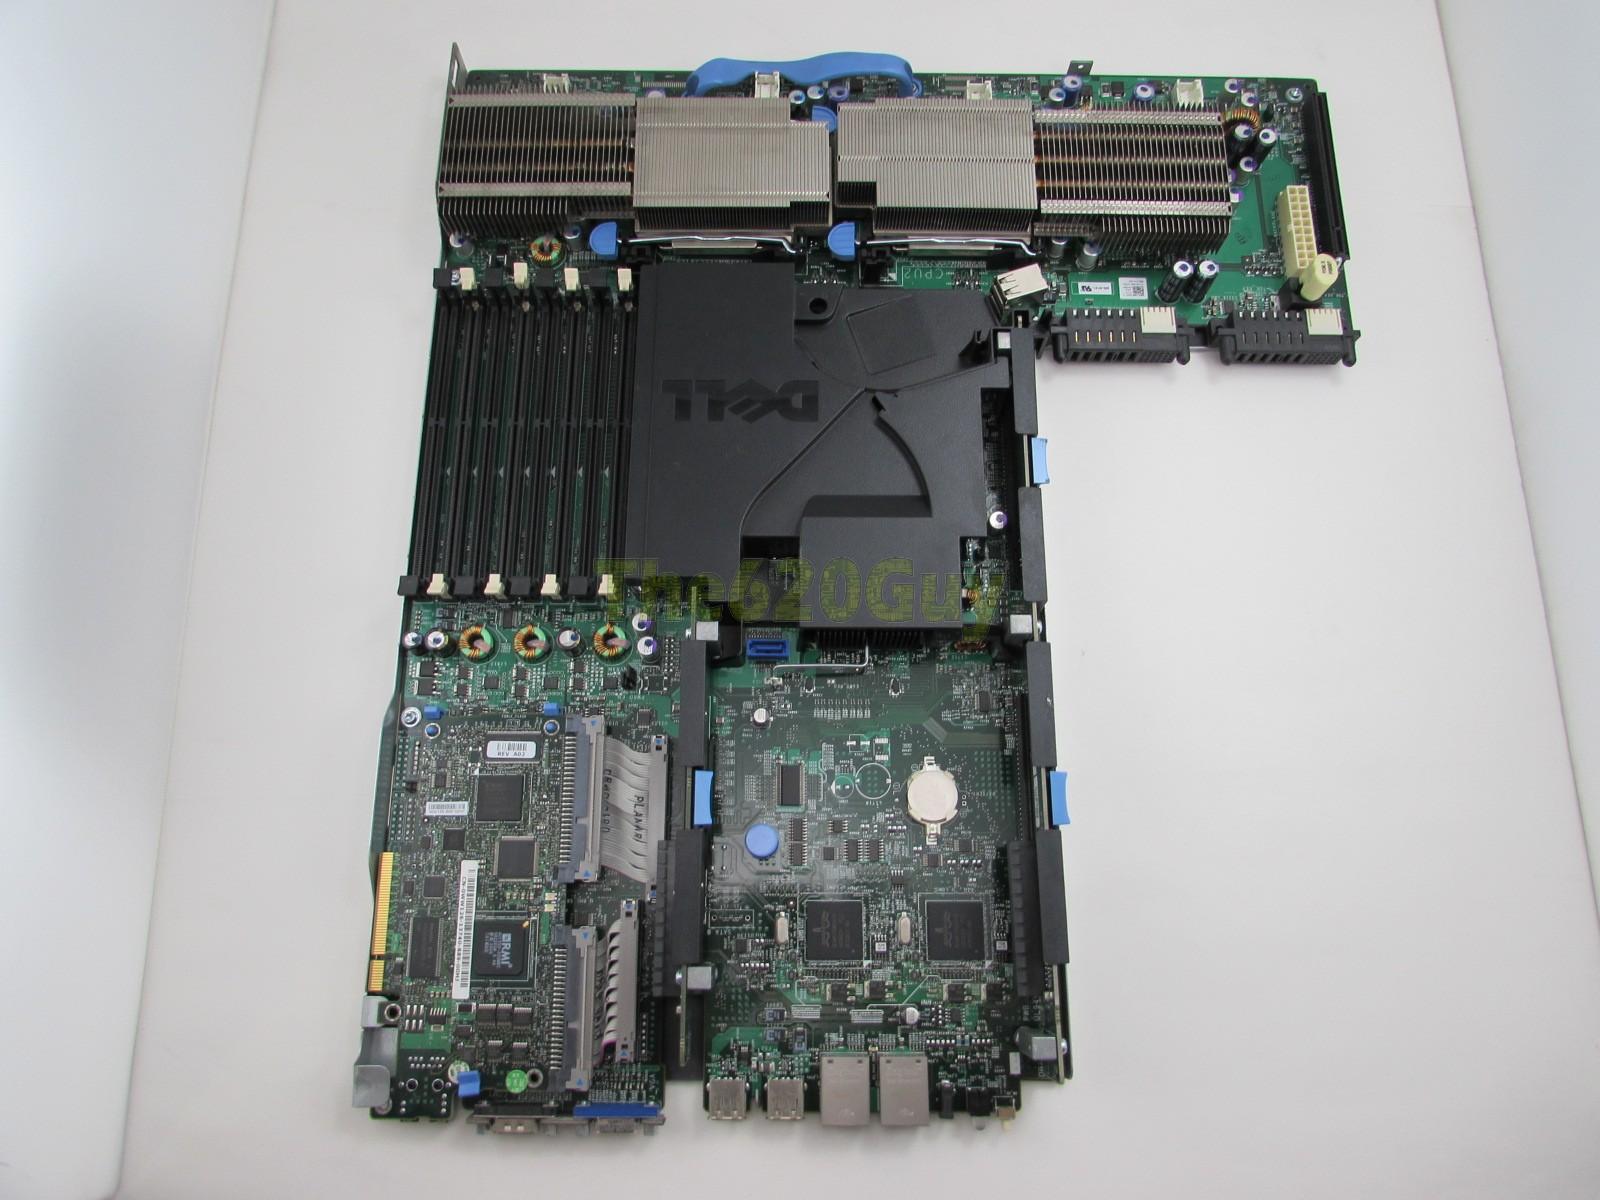 4X4GB 2RX4 PC2-5300F DDR2-667 FBDIMM For Dell Precision SC1430 M600 T7400 16GB